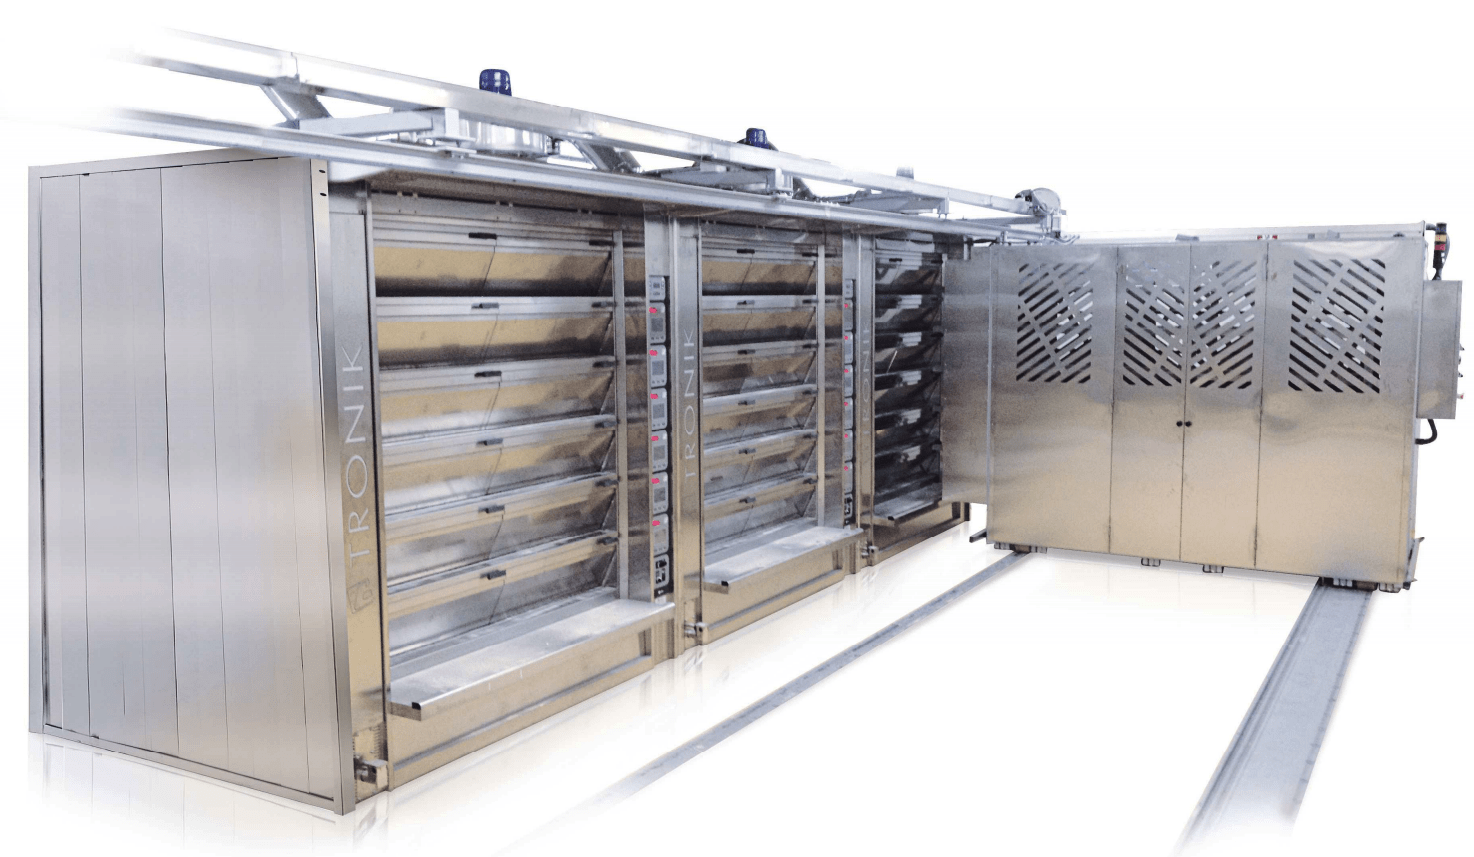 Tagliavini | Industrial Oven Loader| Multi-Deck Oven Loader | Bakery Equipment